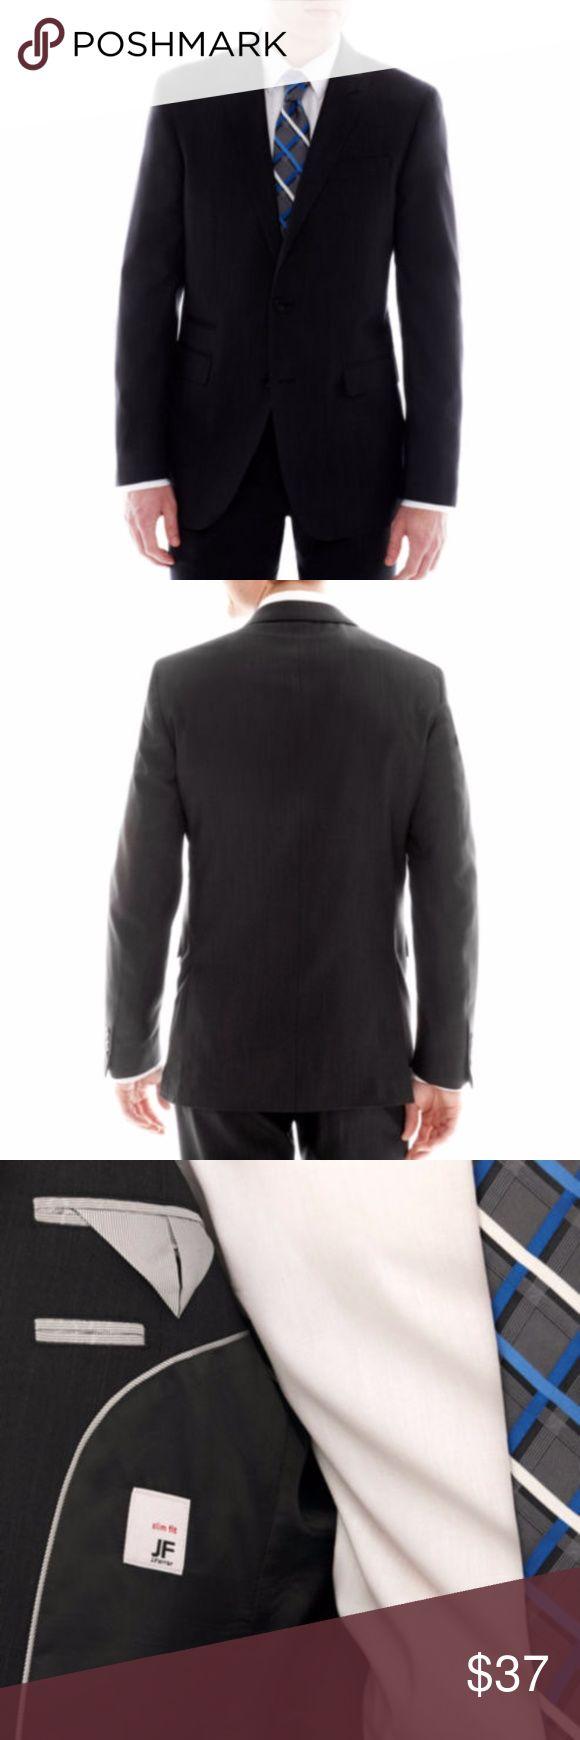 Pict j ferrar modern fit 1 - New Jf J Ferrar Slim Fit Suit Jacket 38 Reg Black Boutique